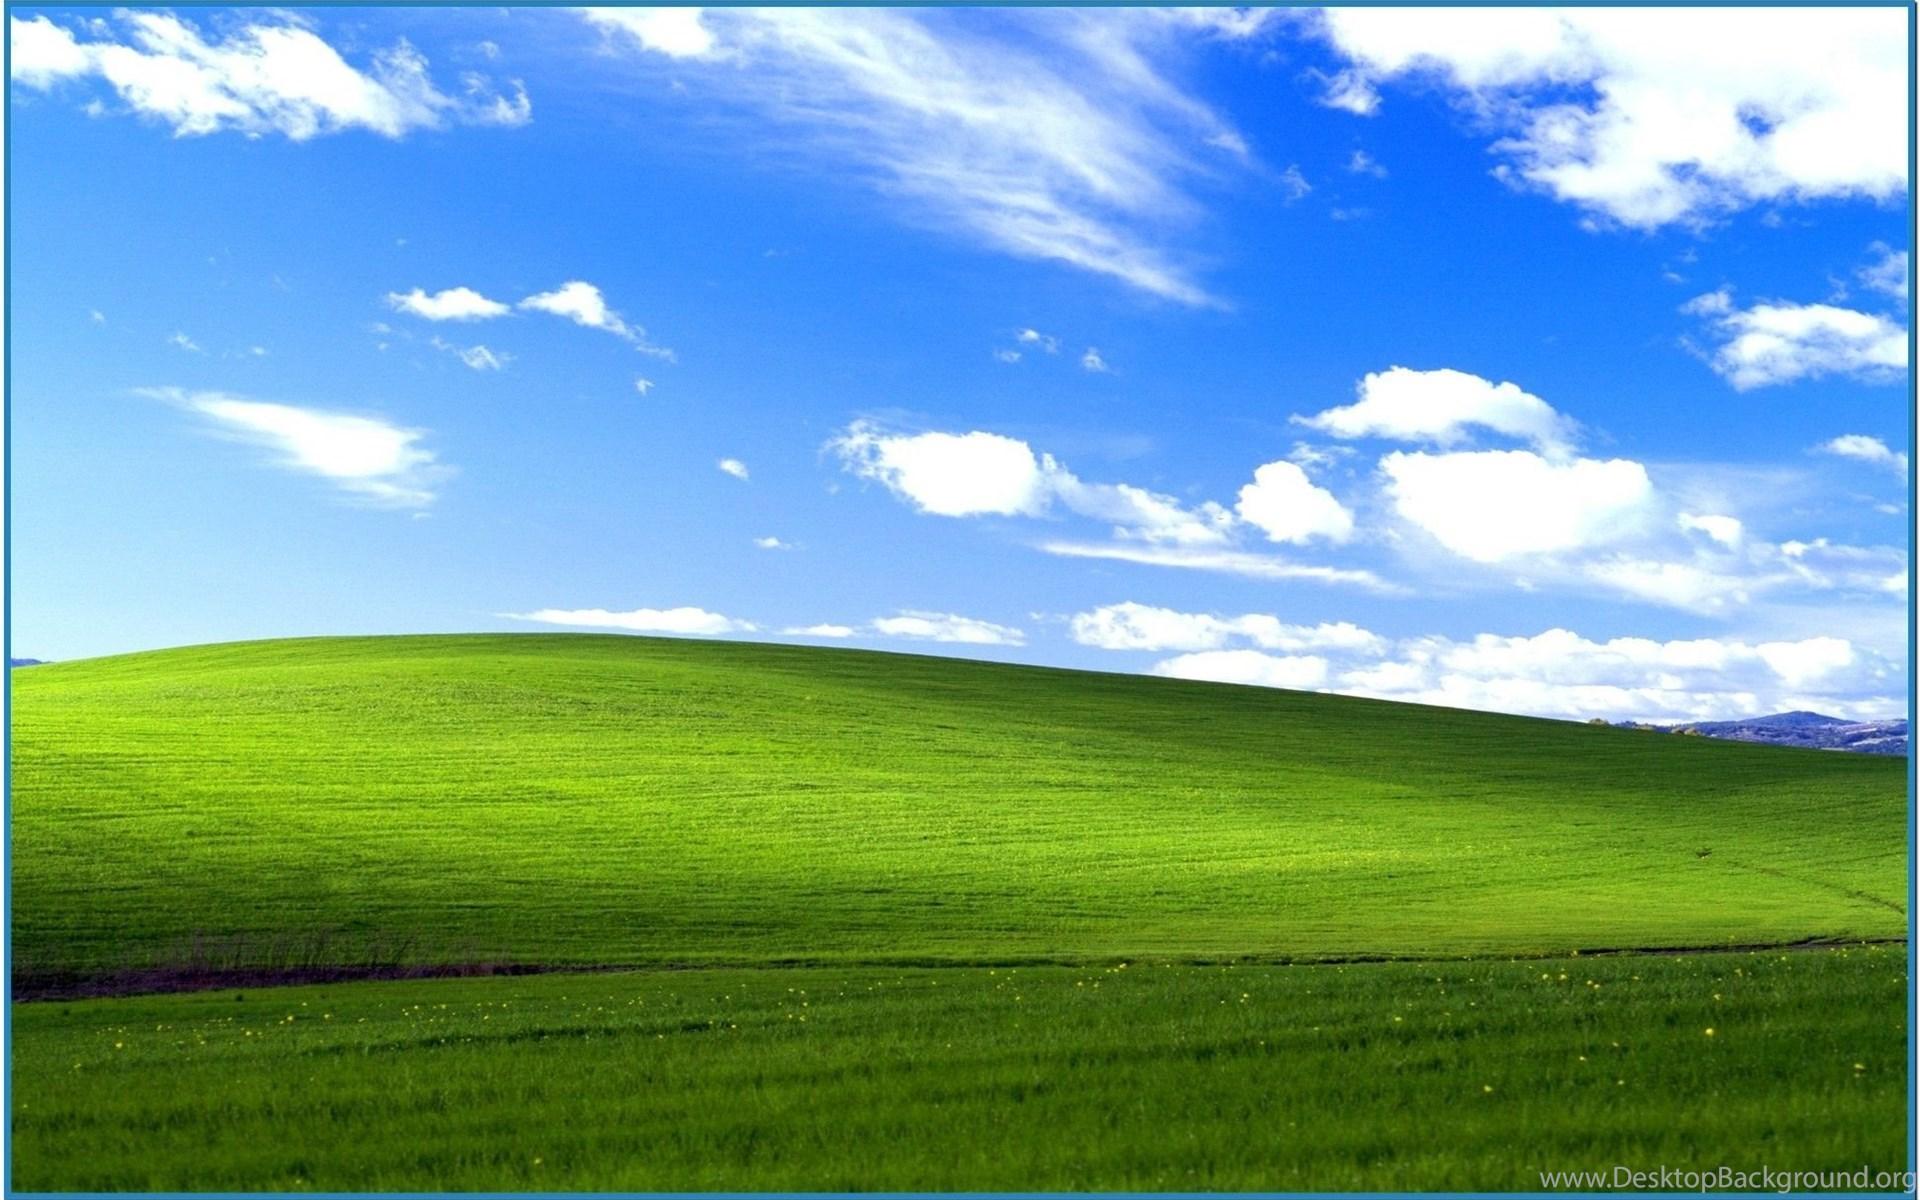 backgrounds screensavers desktop screensaver as desktop backgrounds